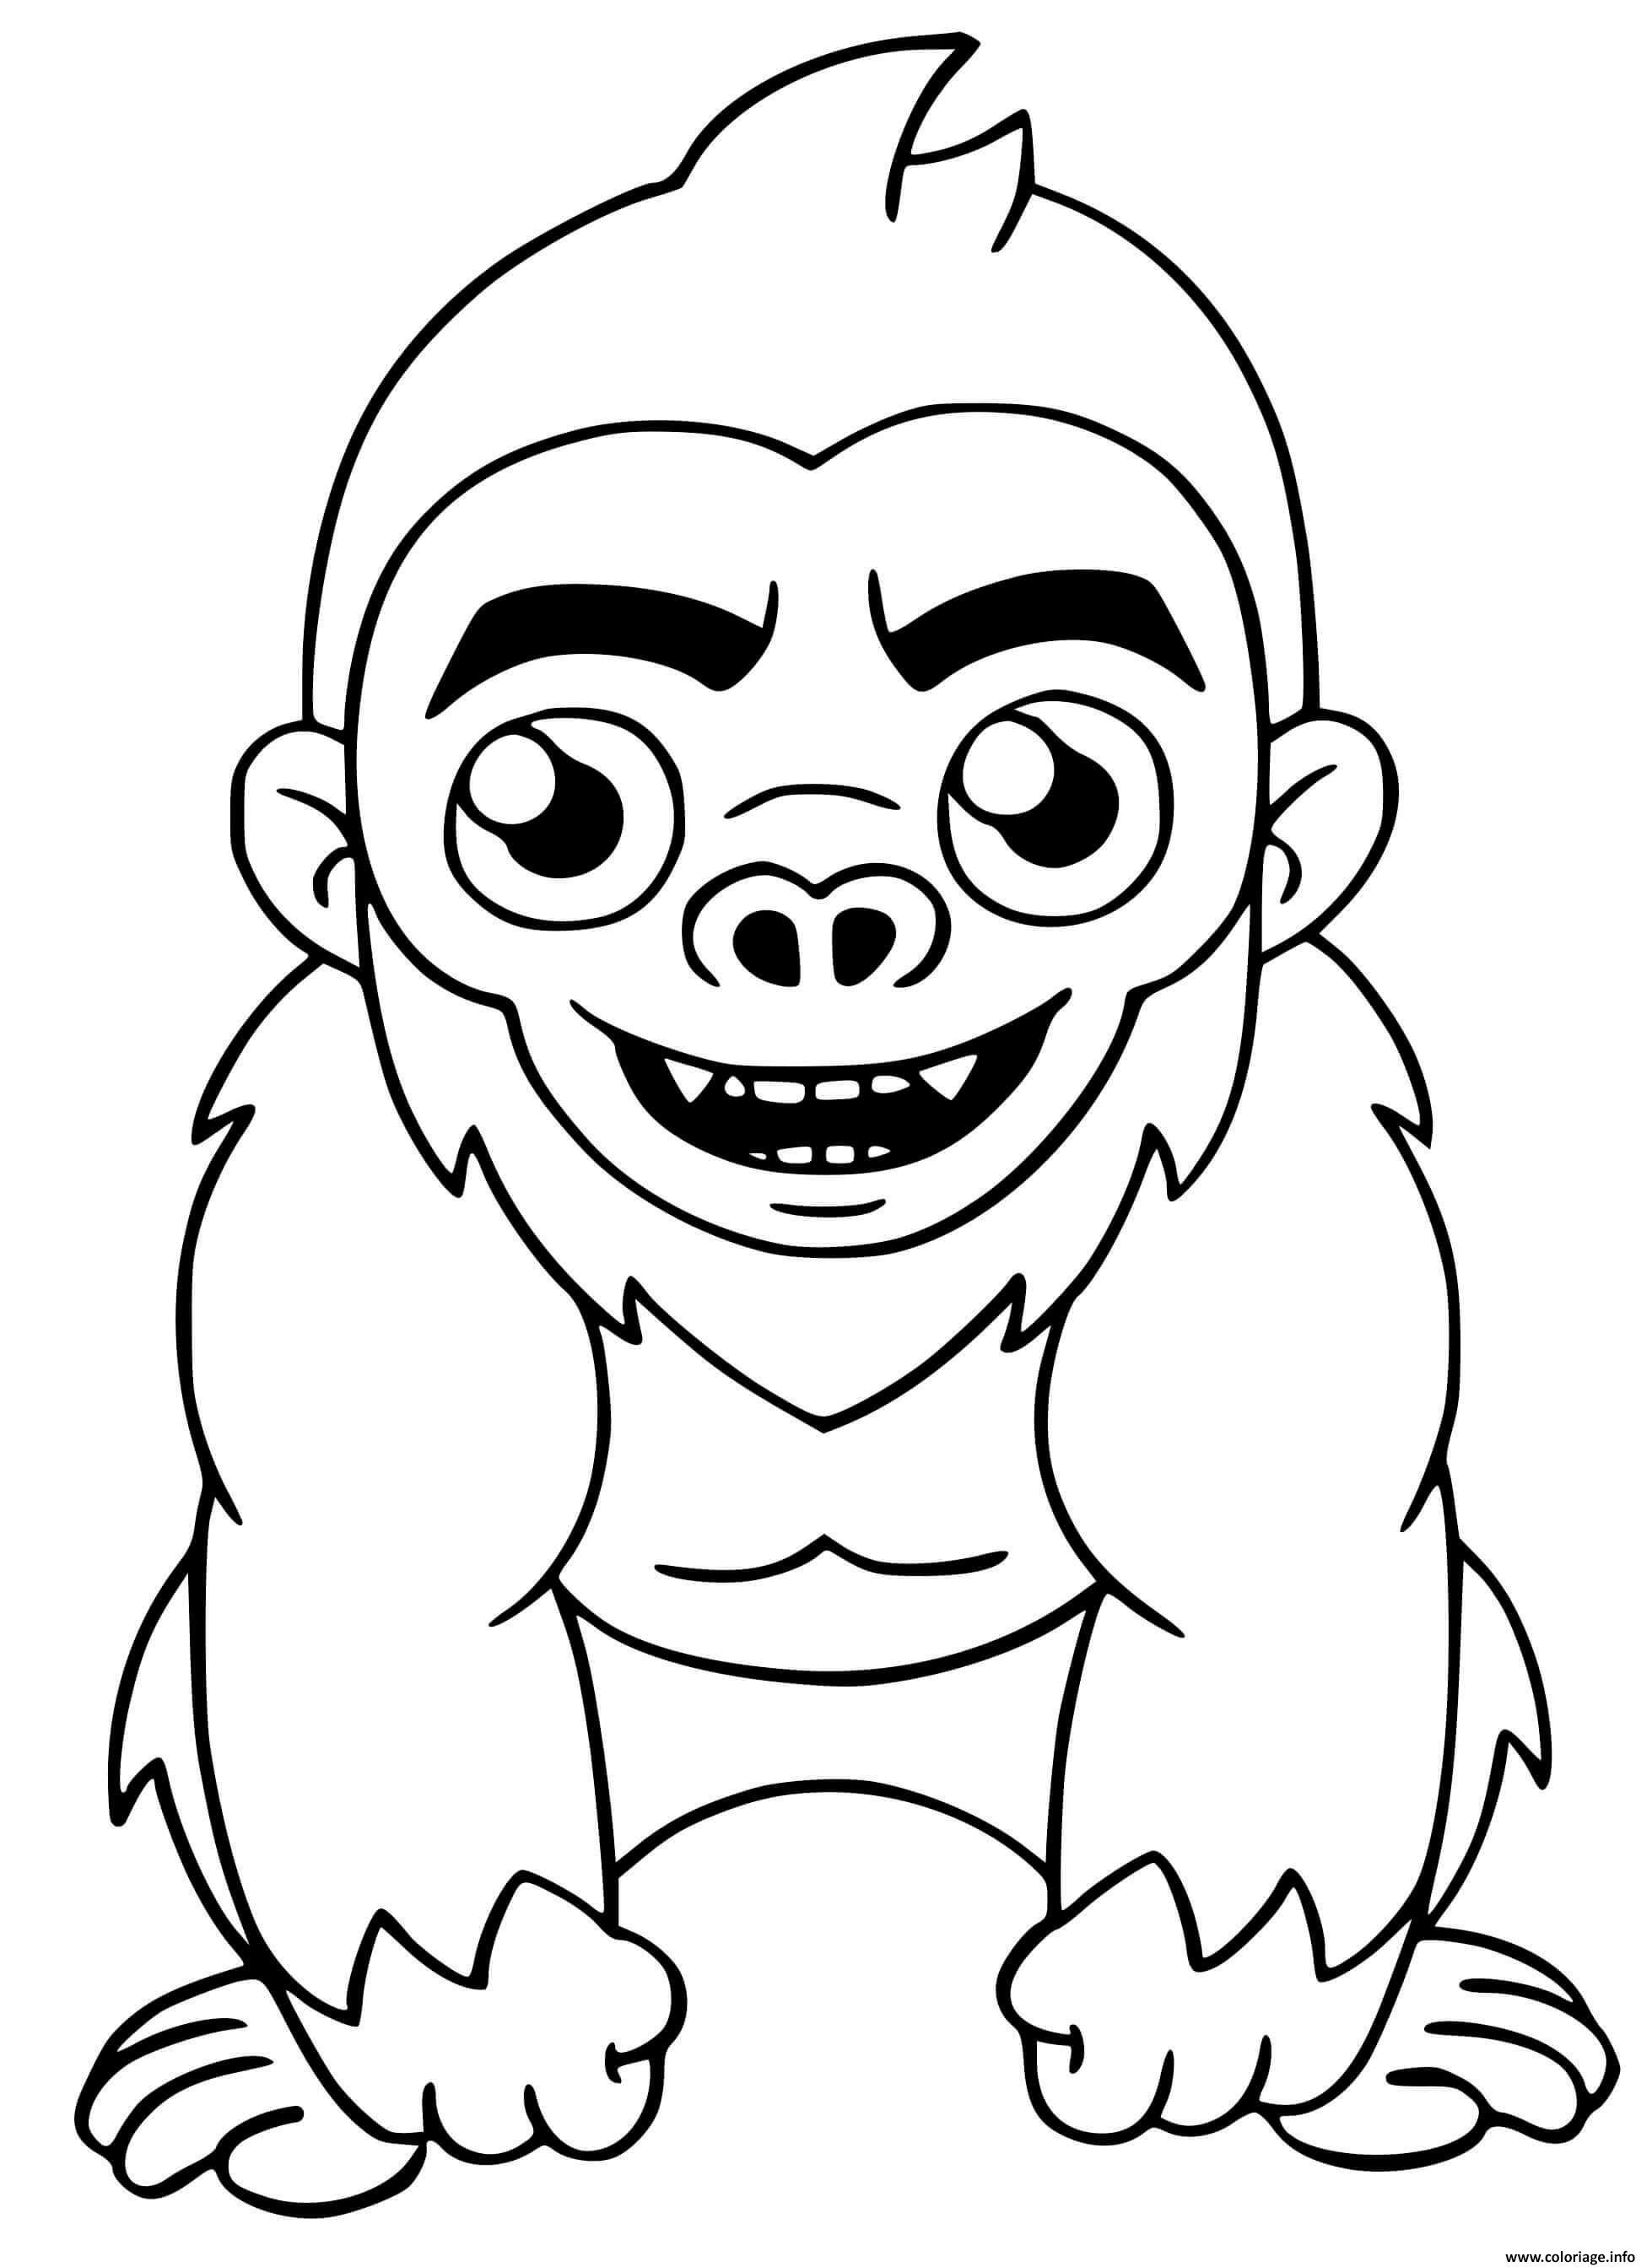 Dessin Fortnite Beast Boy Monkey Skin Coloriage Gratuit à Imprimer